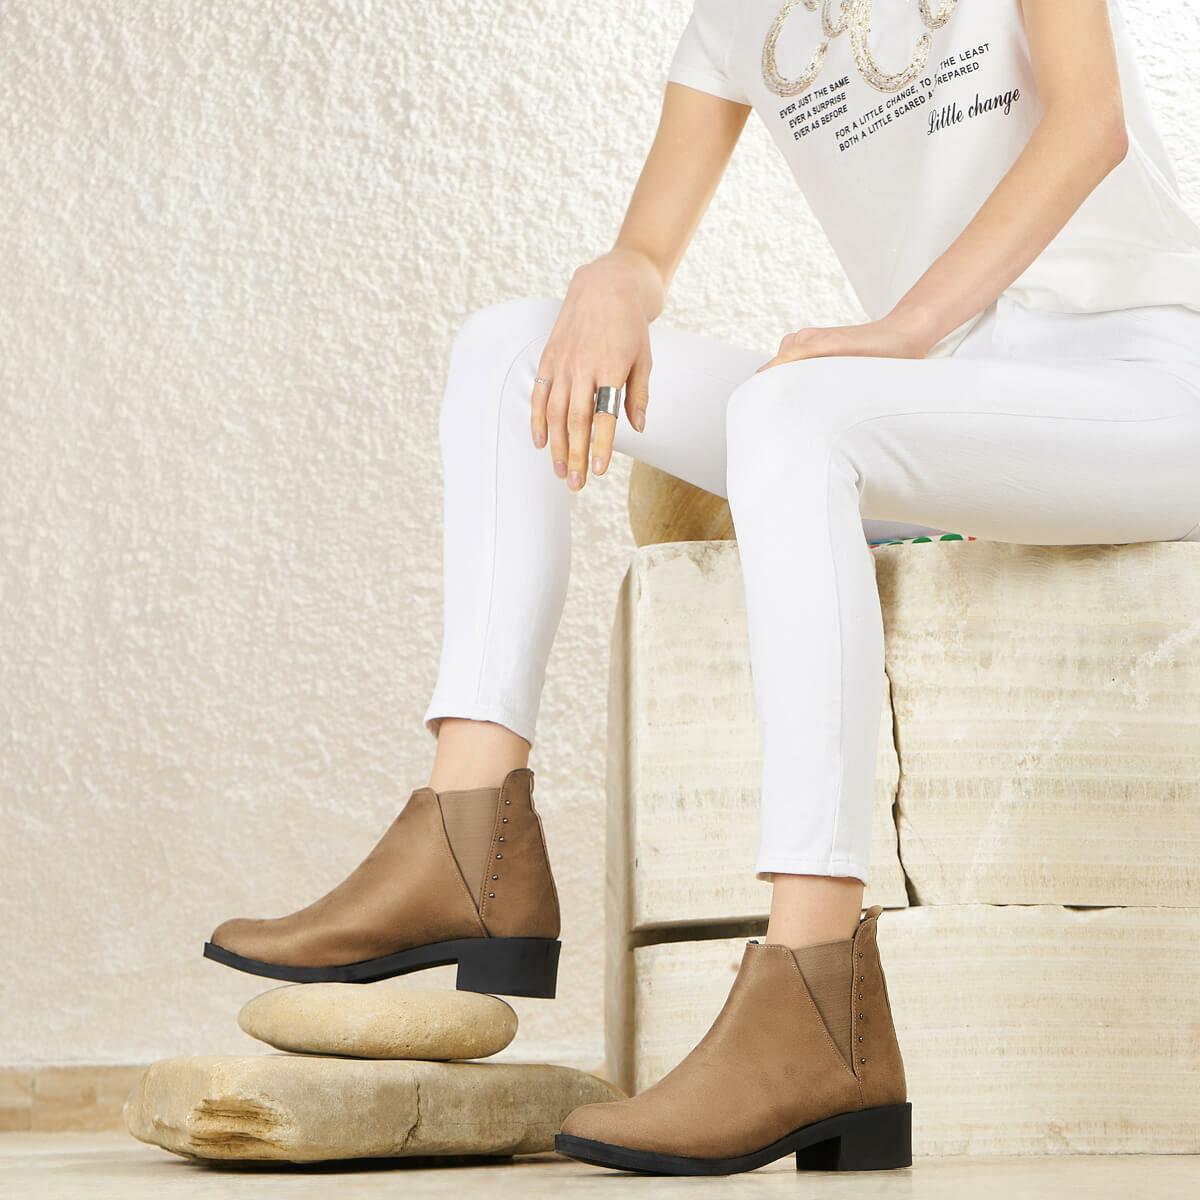 FLO FAITH11Z SHEEPSKIN Mink Women 'S Boots BUTIGO